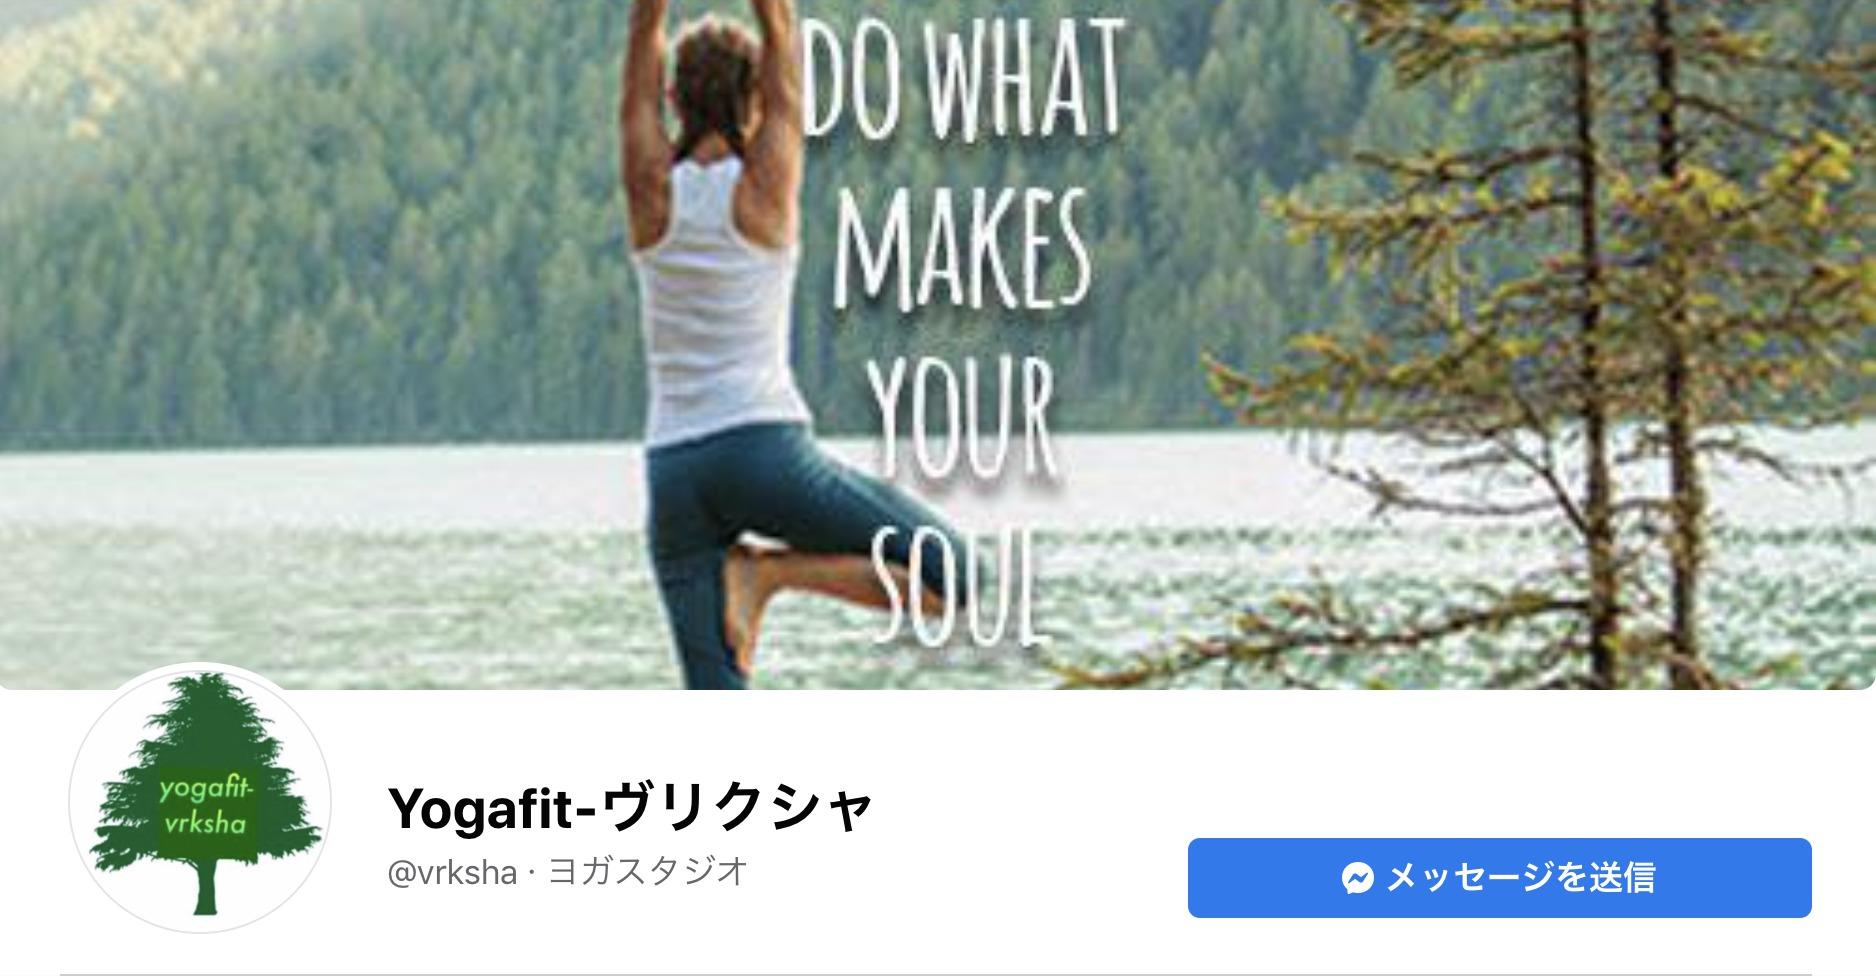 Yogafit-ヴリクシャのフェイスブックページ